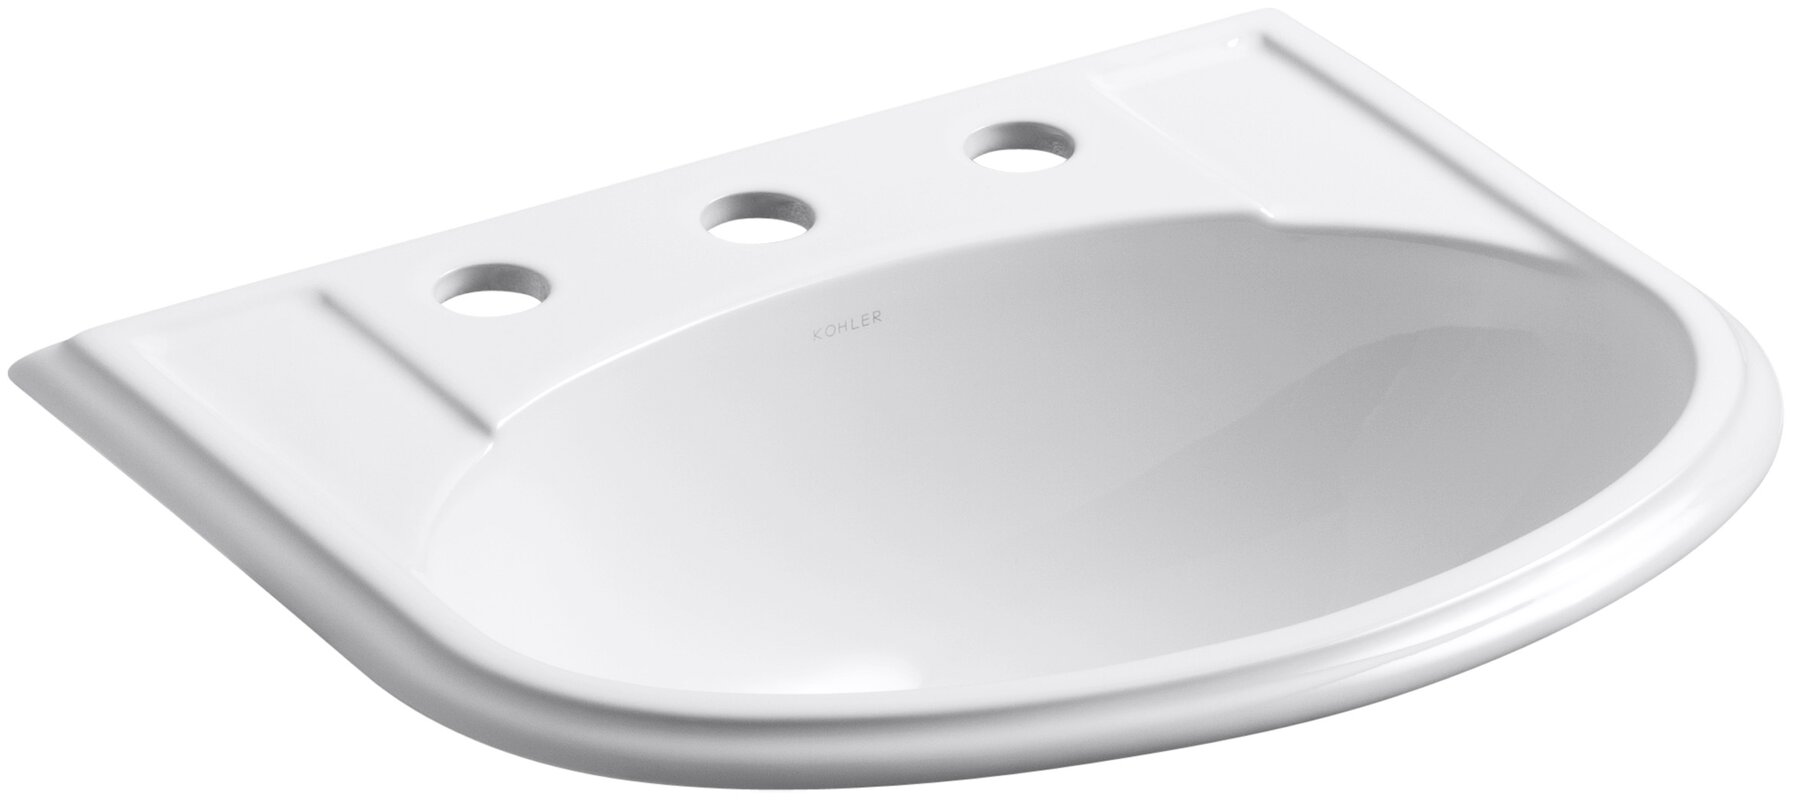 drop in bathroom sinks. Devonshire  Ceramic U Shaped Drop In Bathroom Sink with Overflow